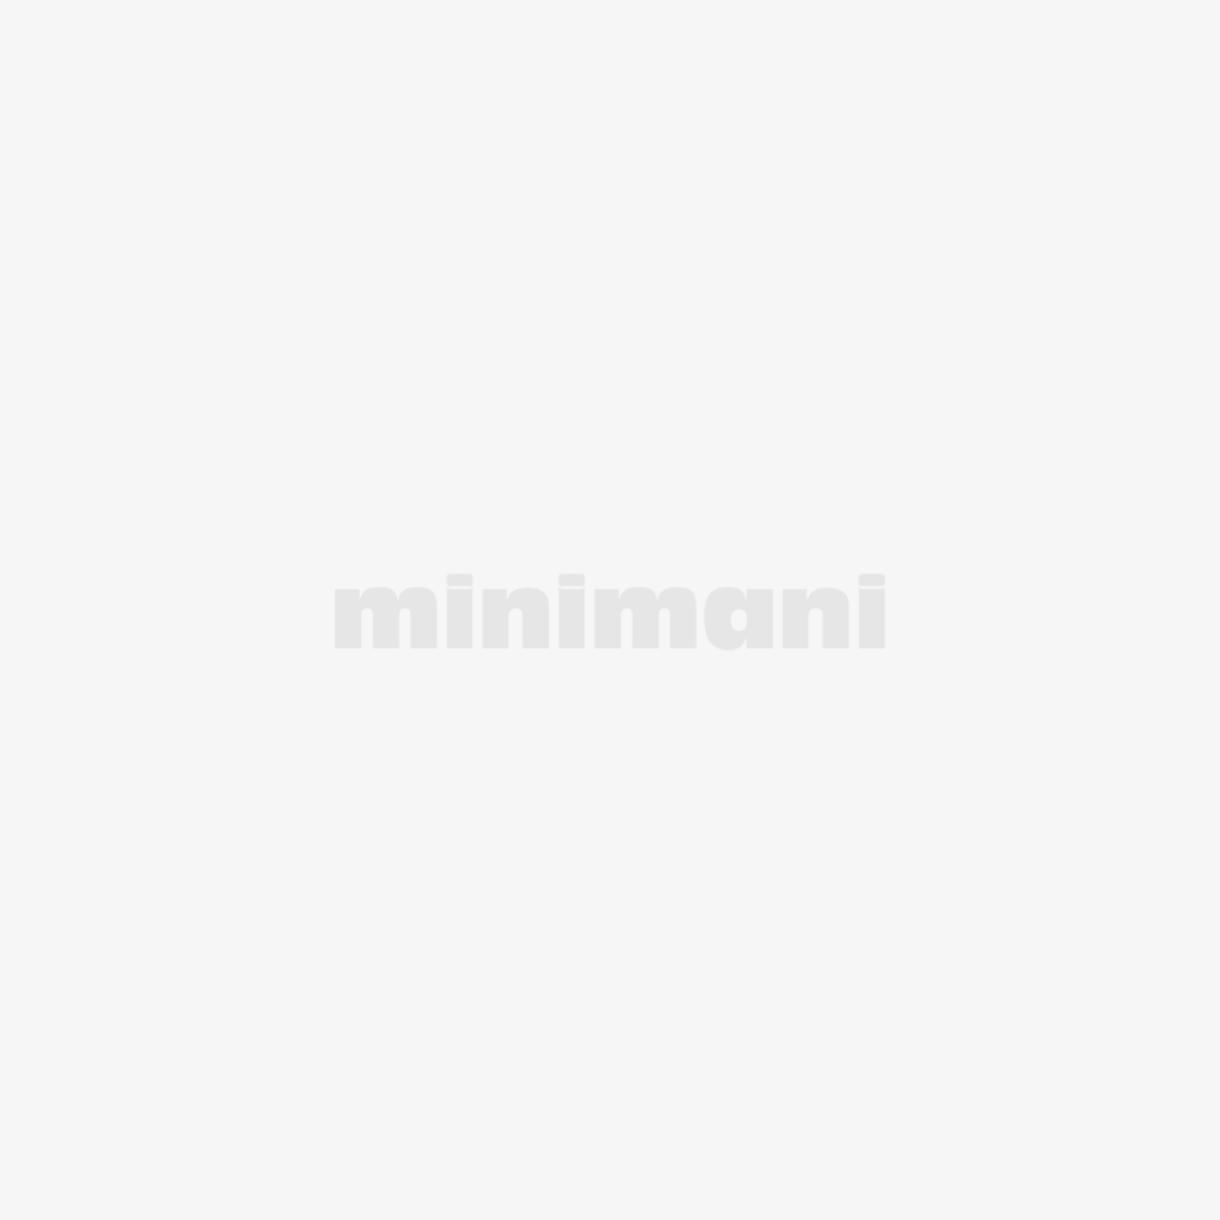 AIRAM VANAMO VÄLITILAVALAISIN 114 14W PR + K HOPEA  G5 3